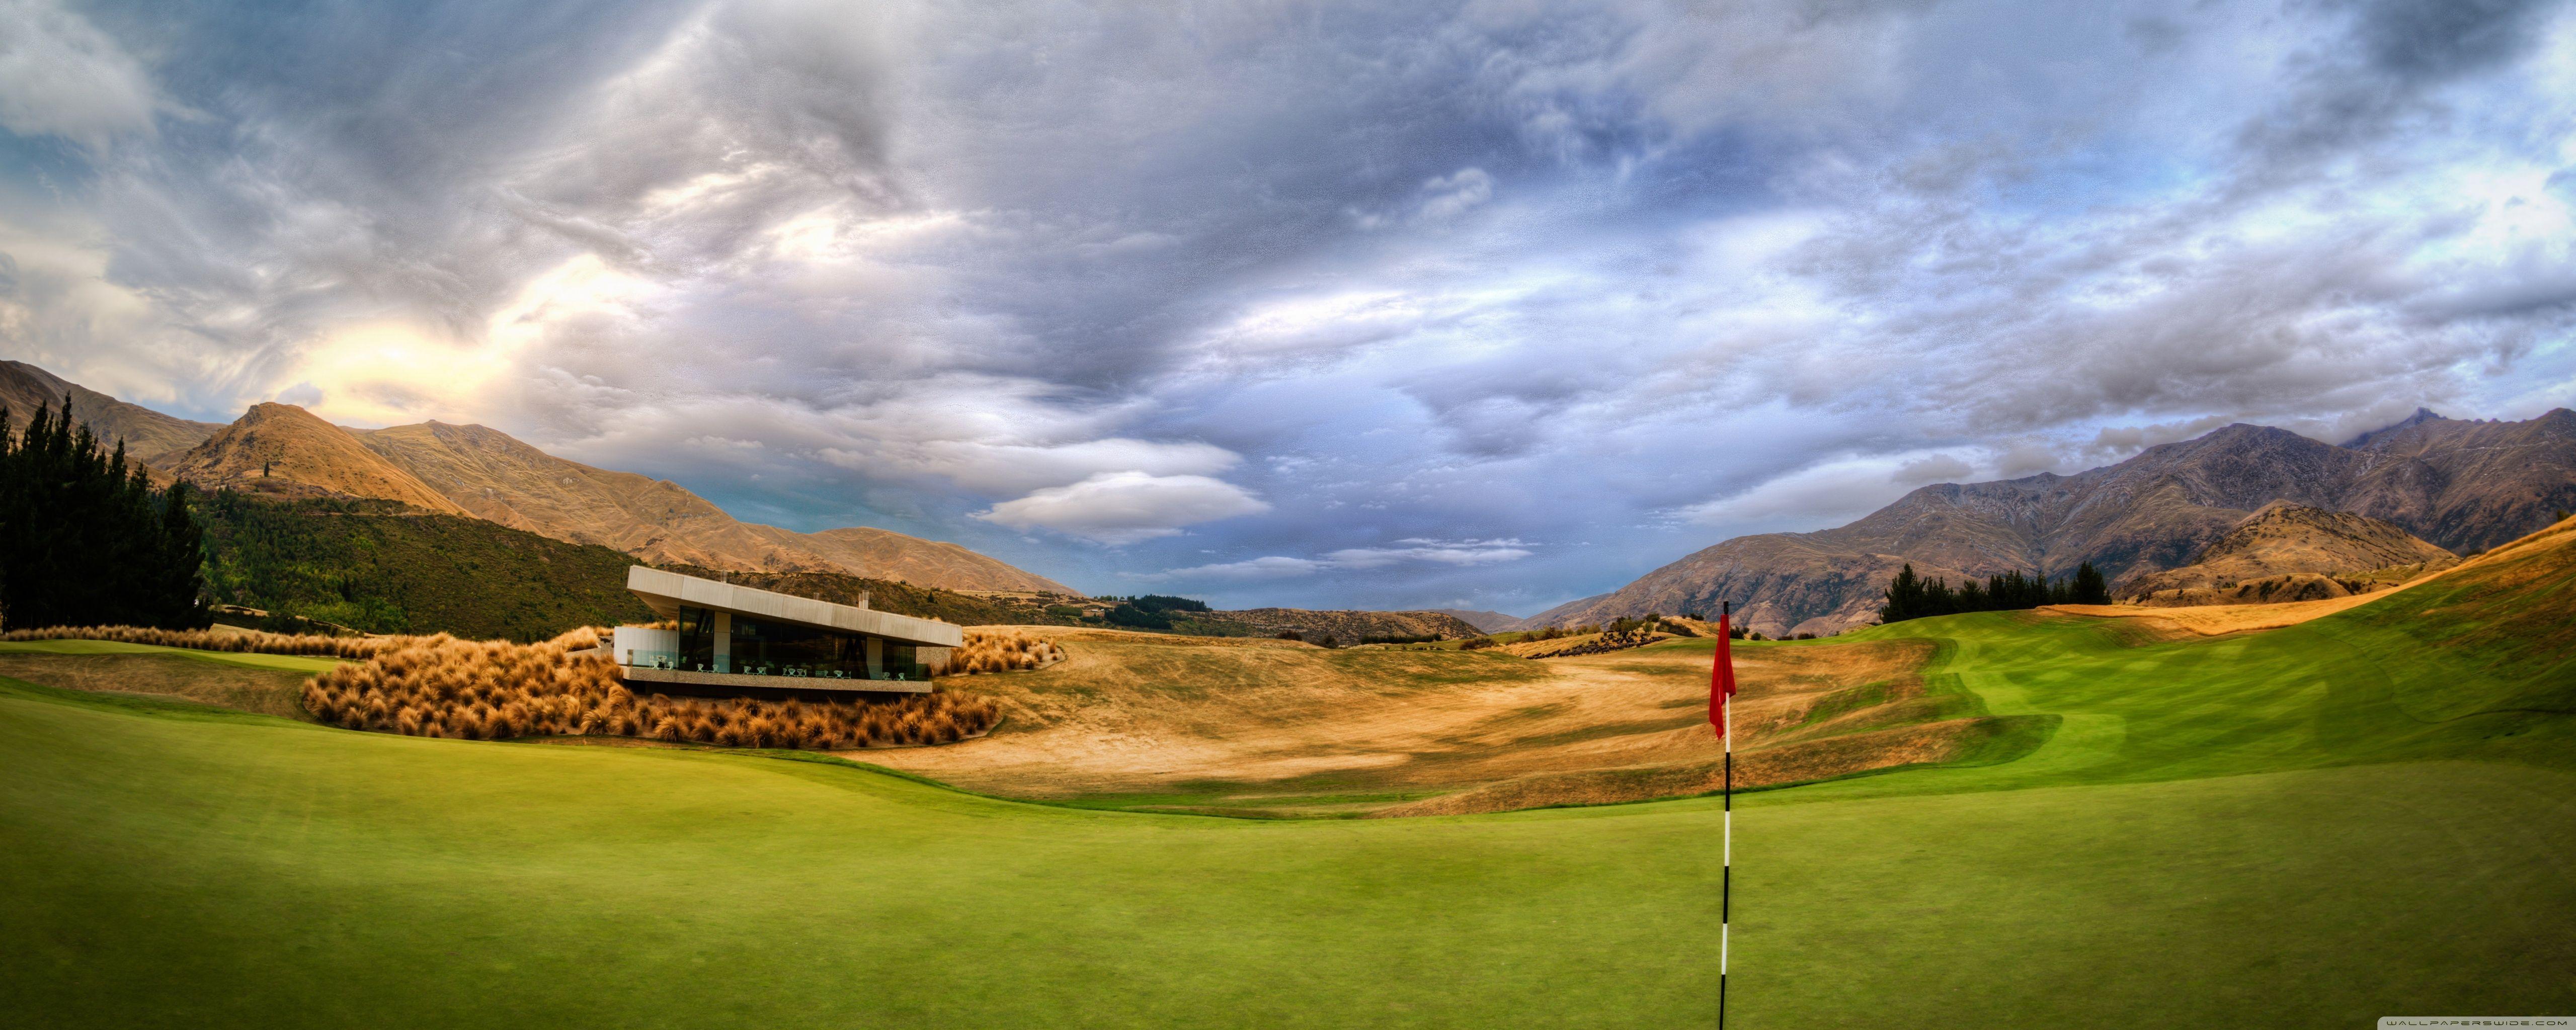 Golf Dual Screen Wallpapers Top Free Golf Dual Screen